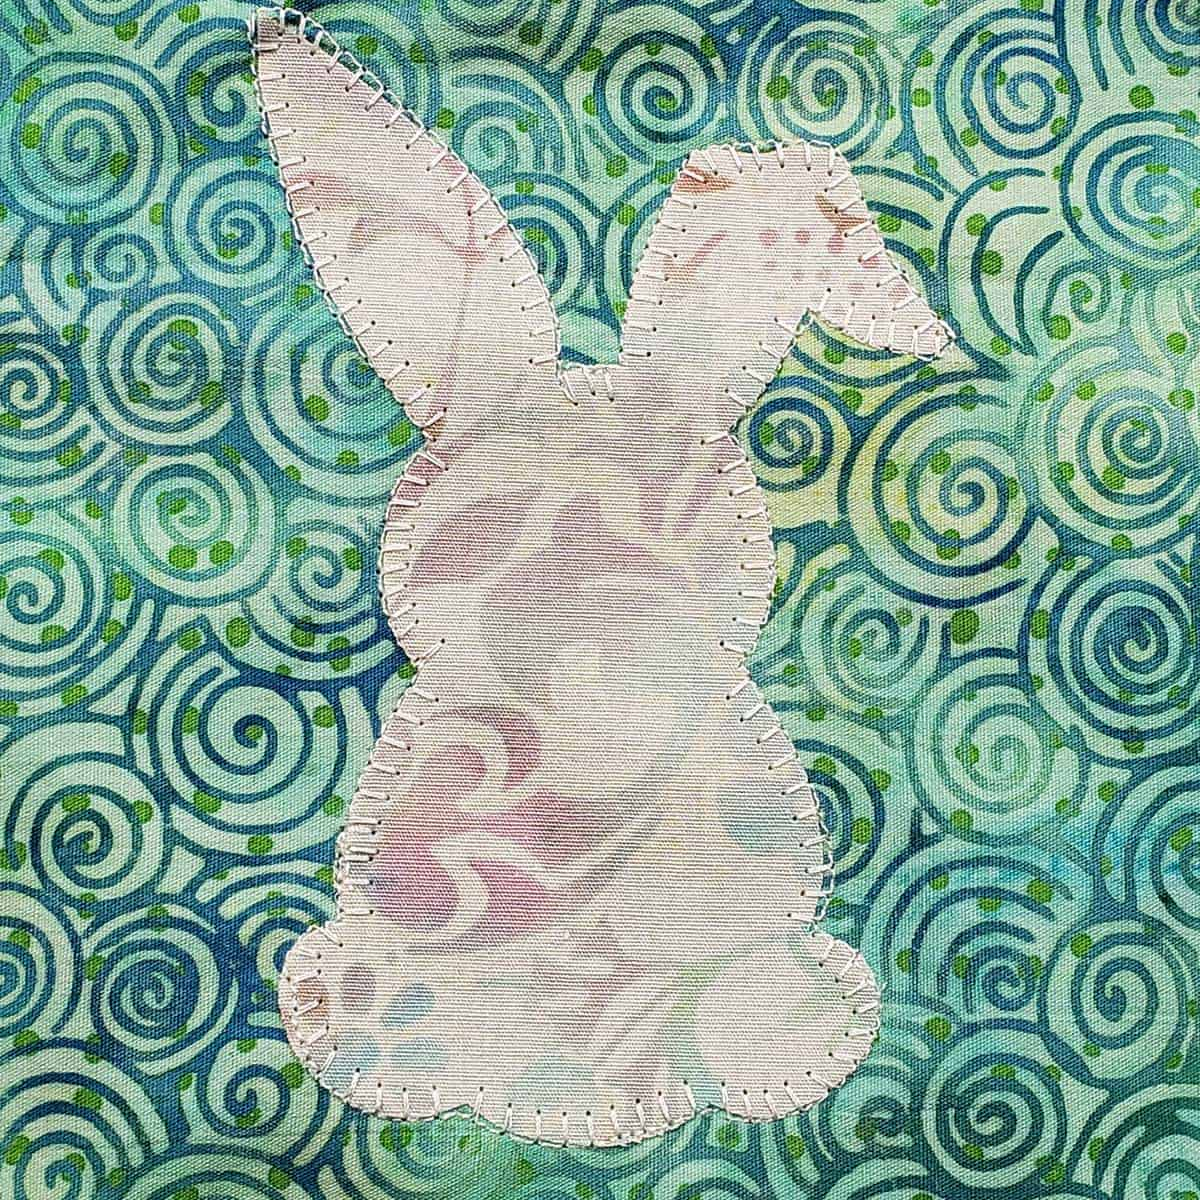 Small rabbit appliqued